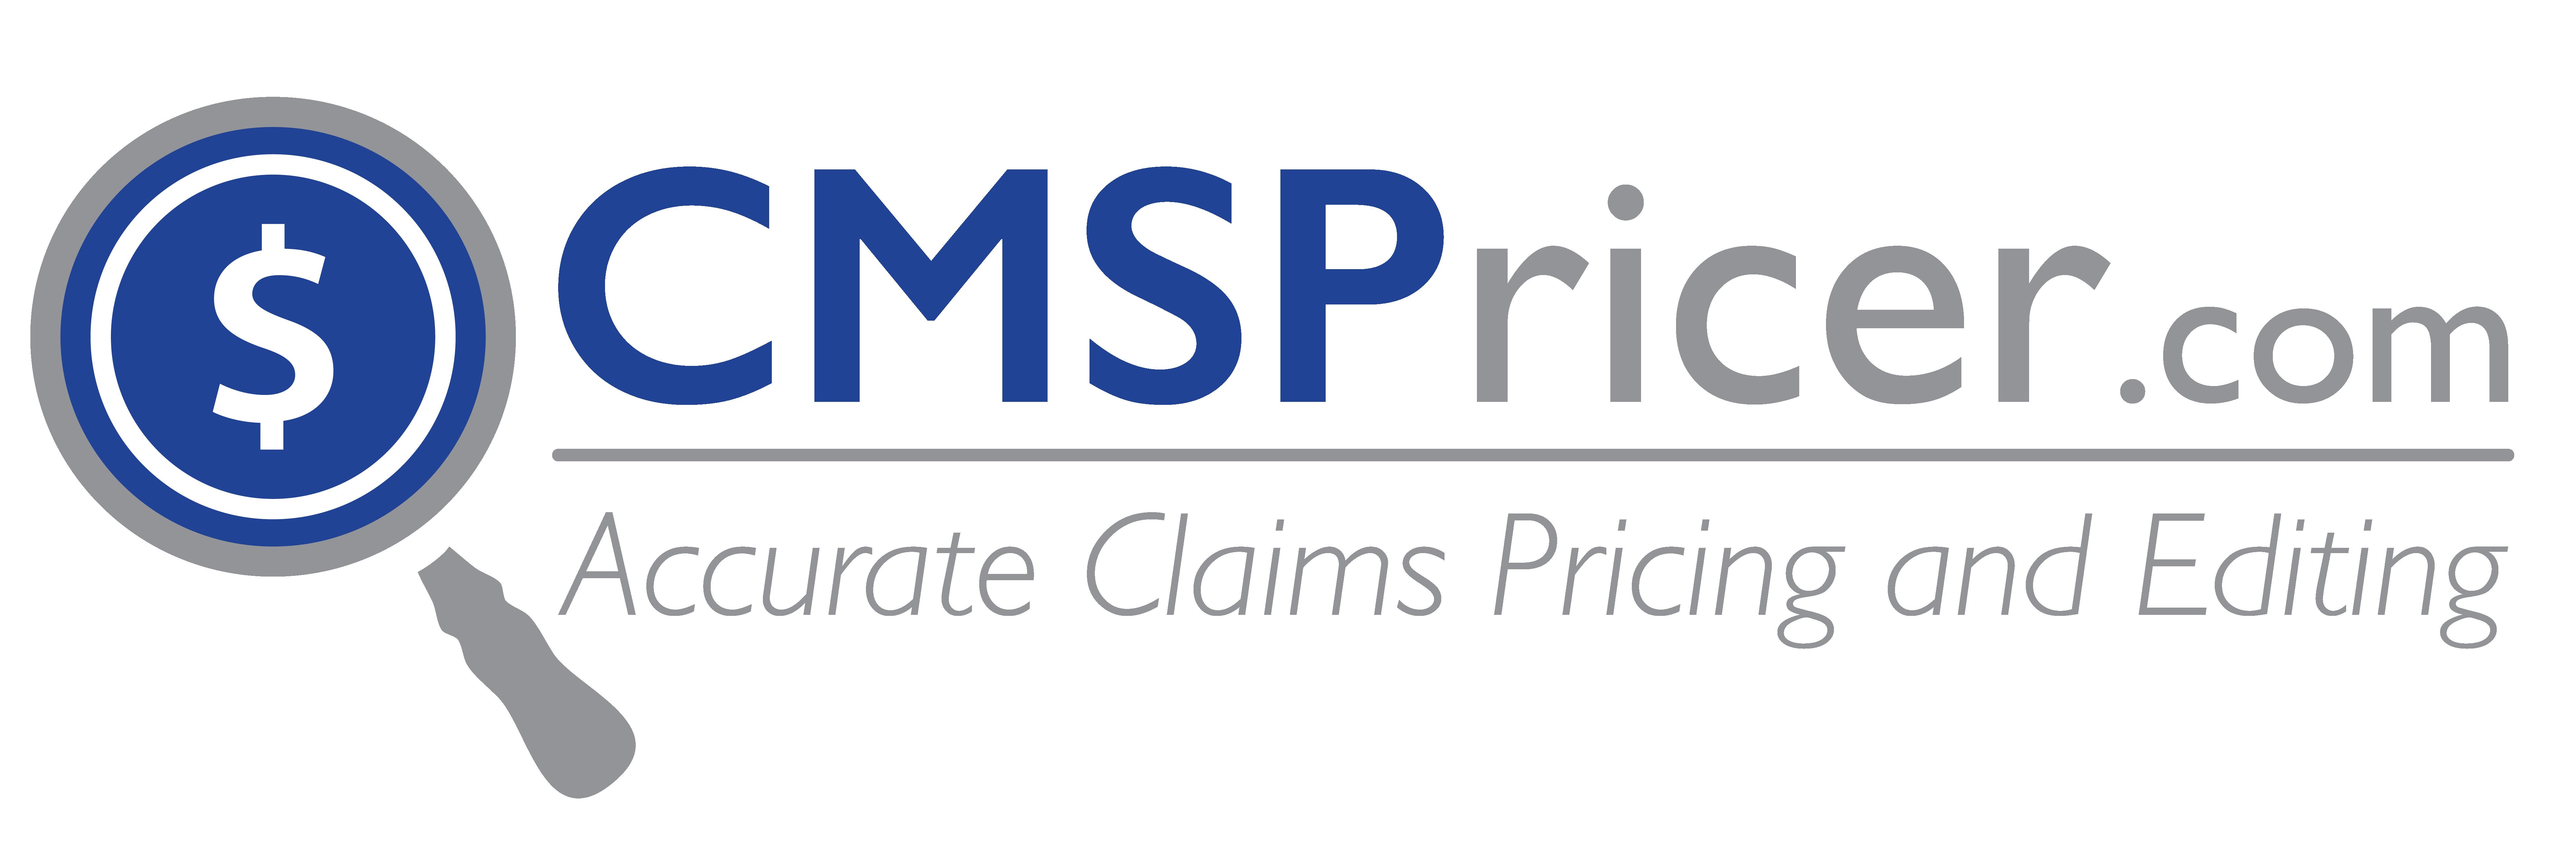 CMSPricer Logo FINAL OL